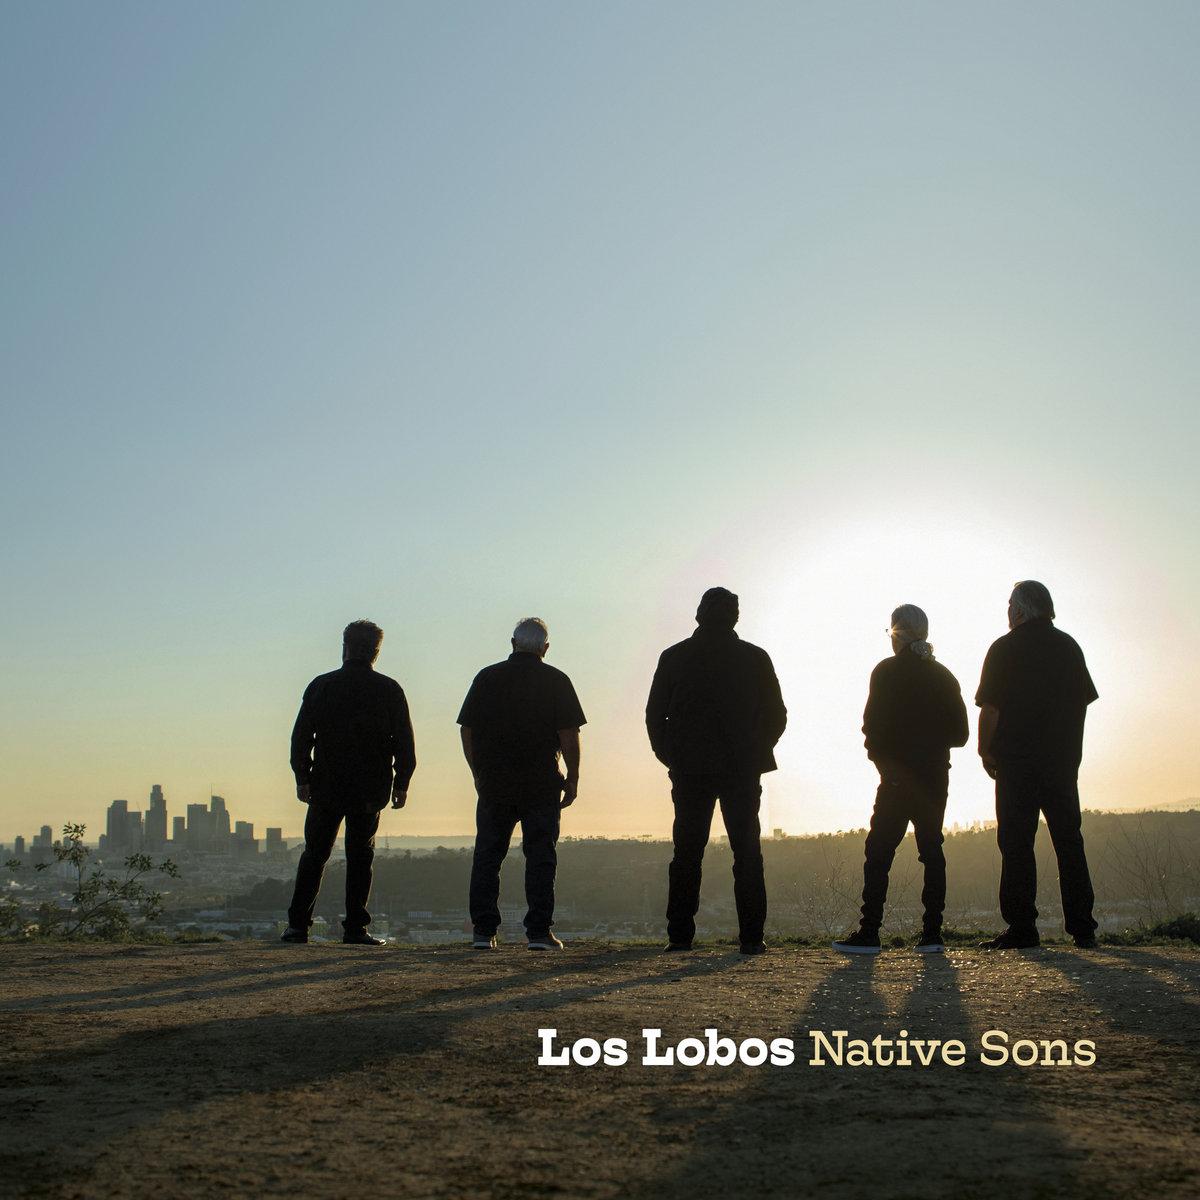 Los Lobos - Native Sons (Coke Bottle Clear Vinyl) [2xLP]